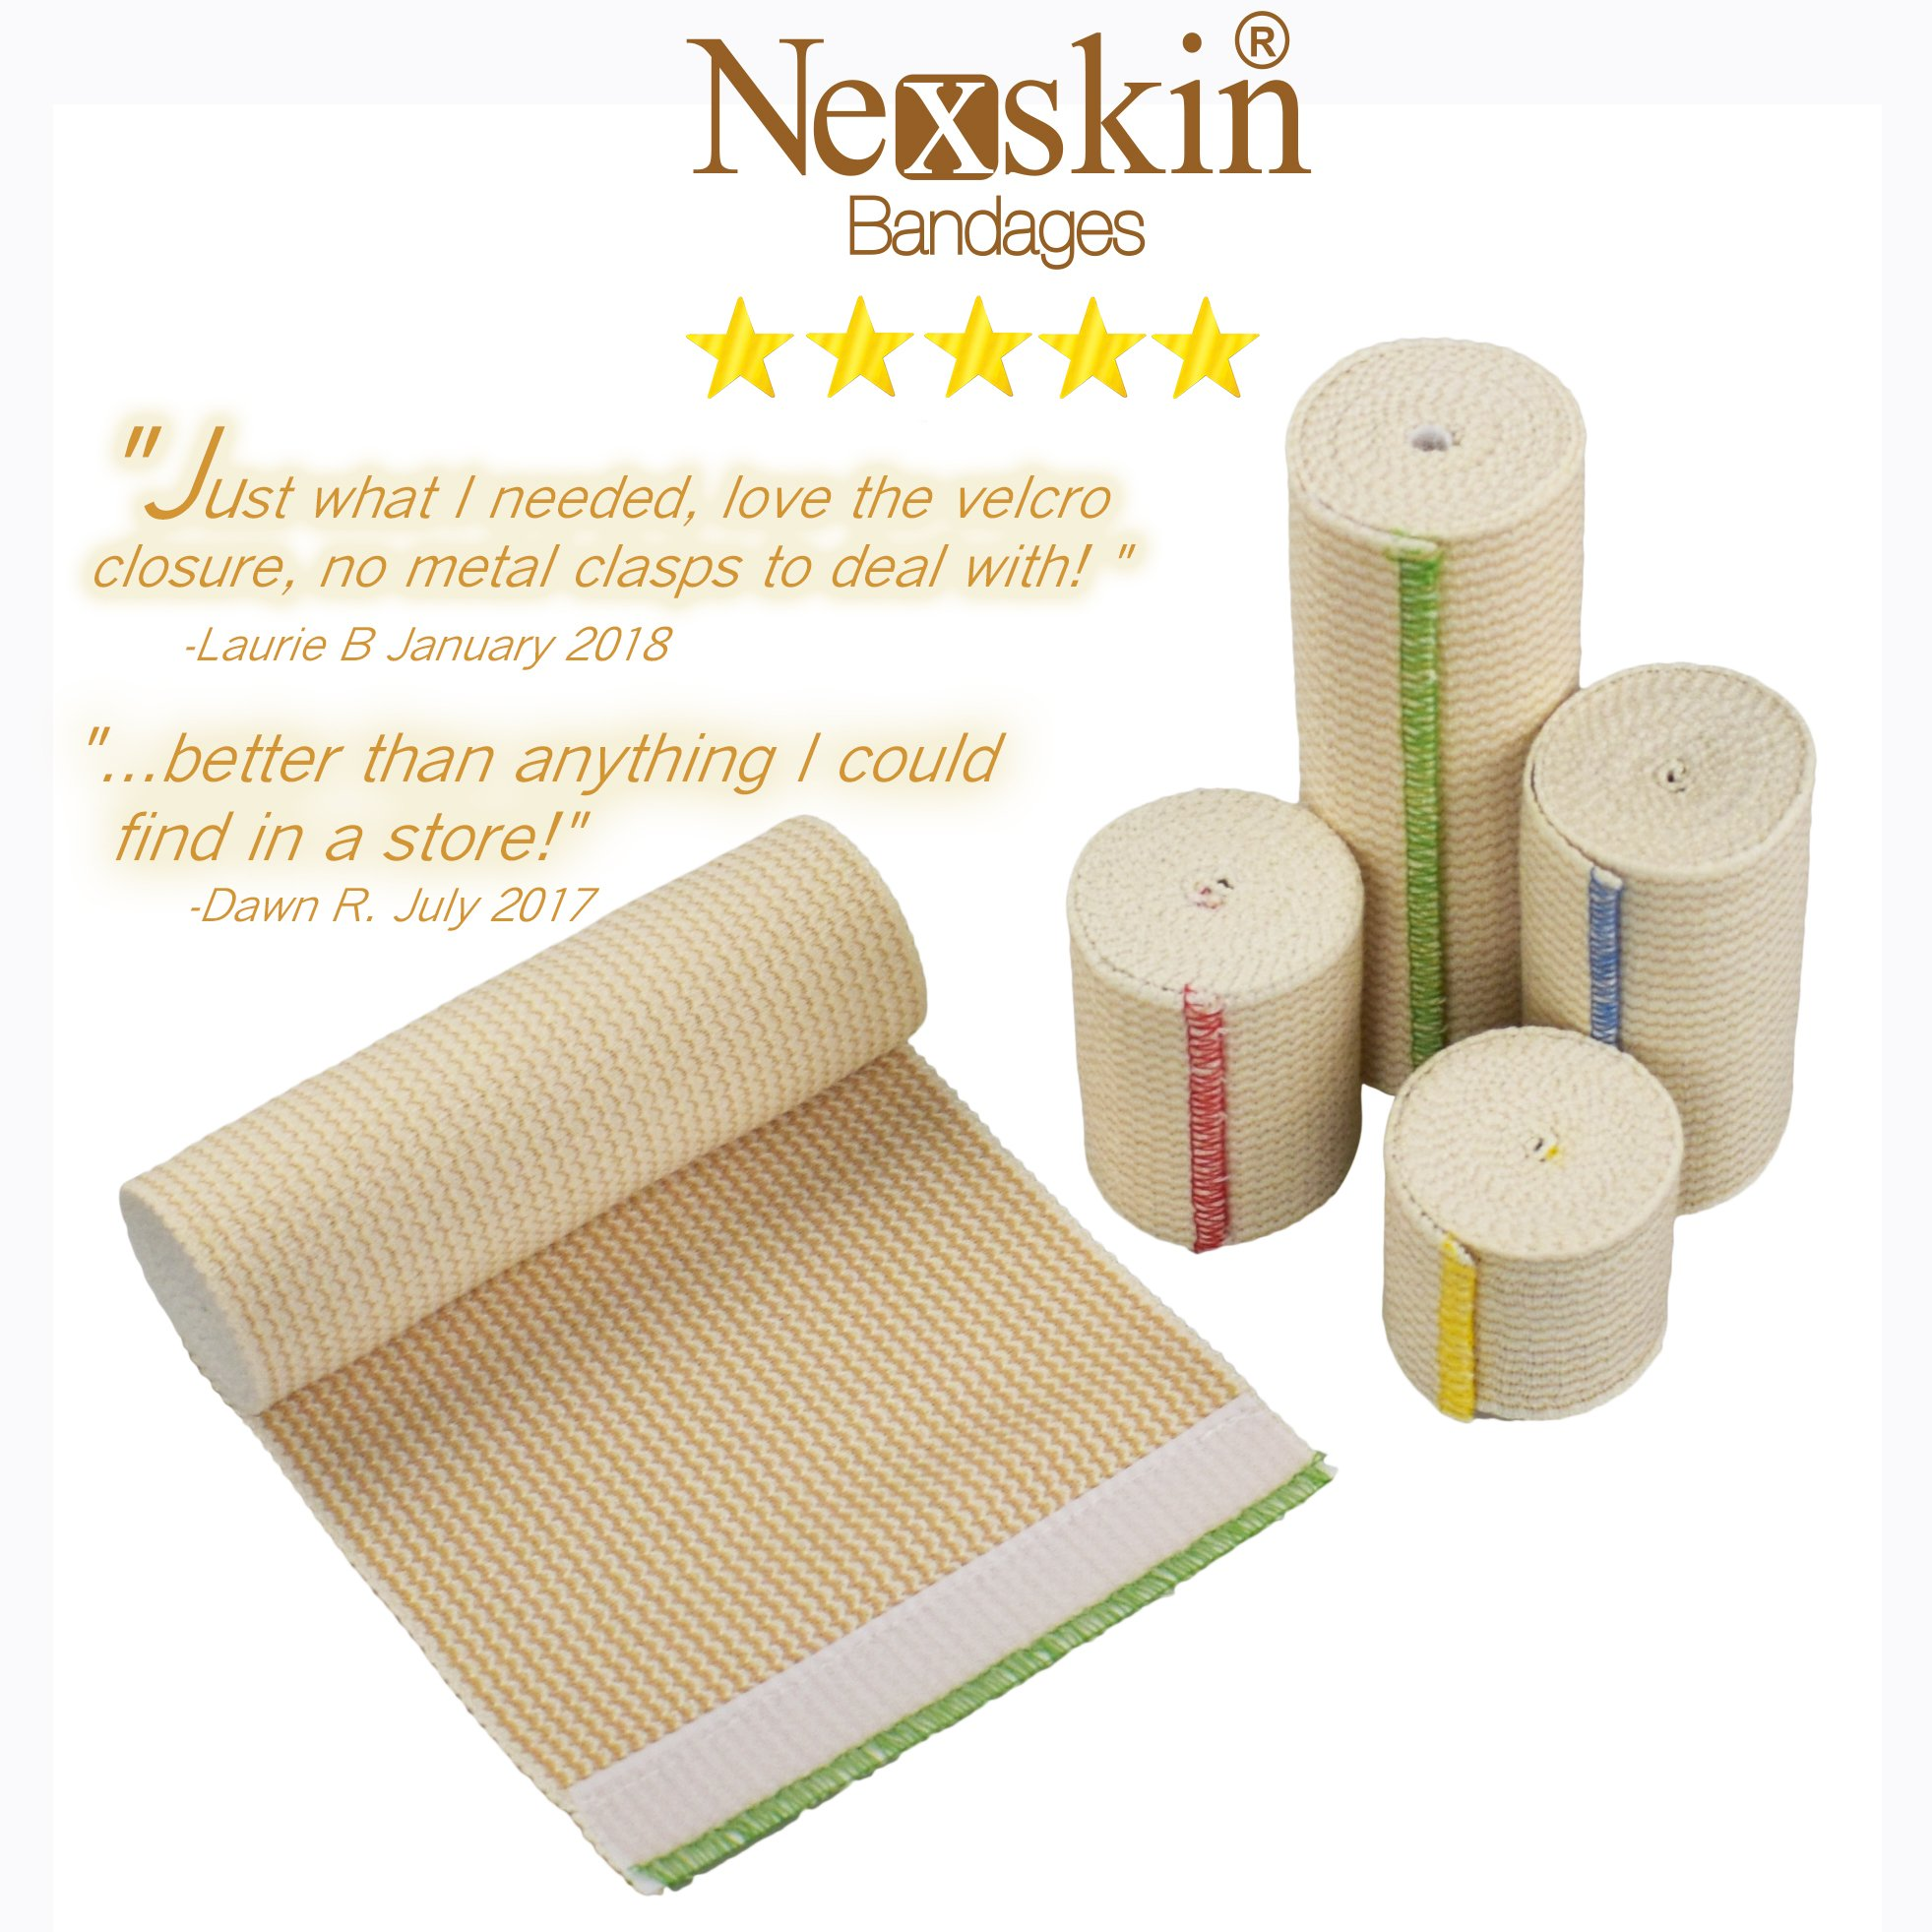 NexSkin Elastic Bandage Wrap with Hook and Loop Closure, 4'' Width - 2 Pack